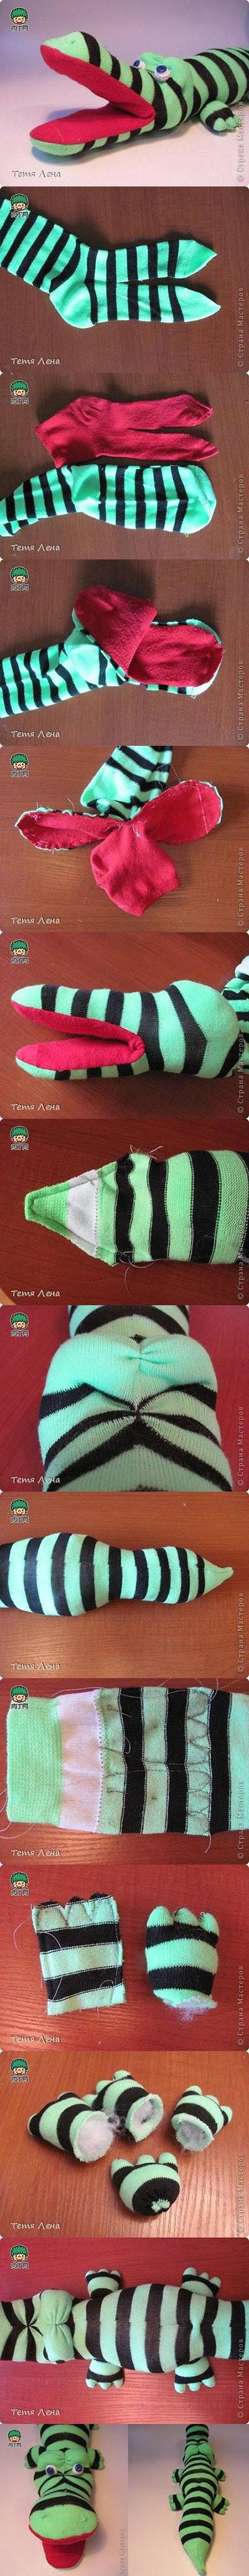 11 DIY Sock Crocodile Stuffed Animal d275c402e538